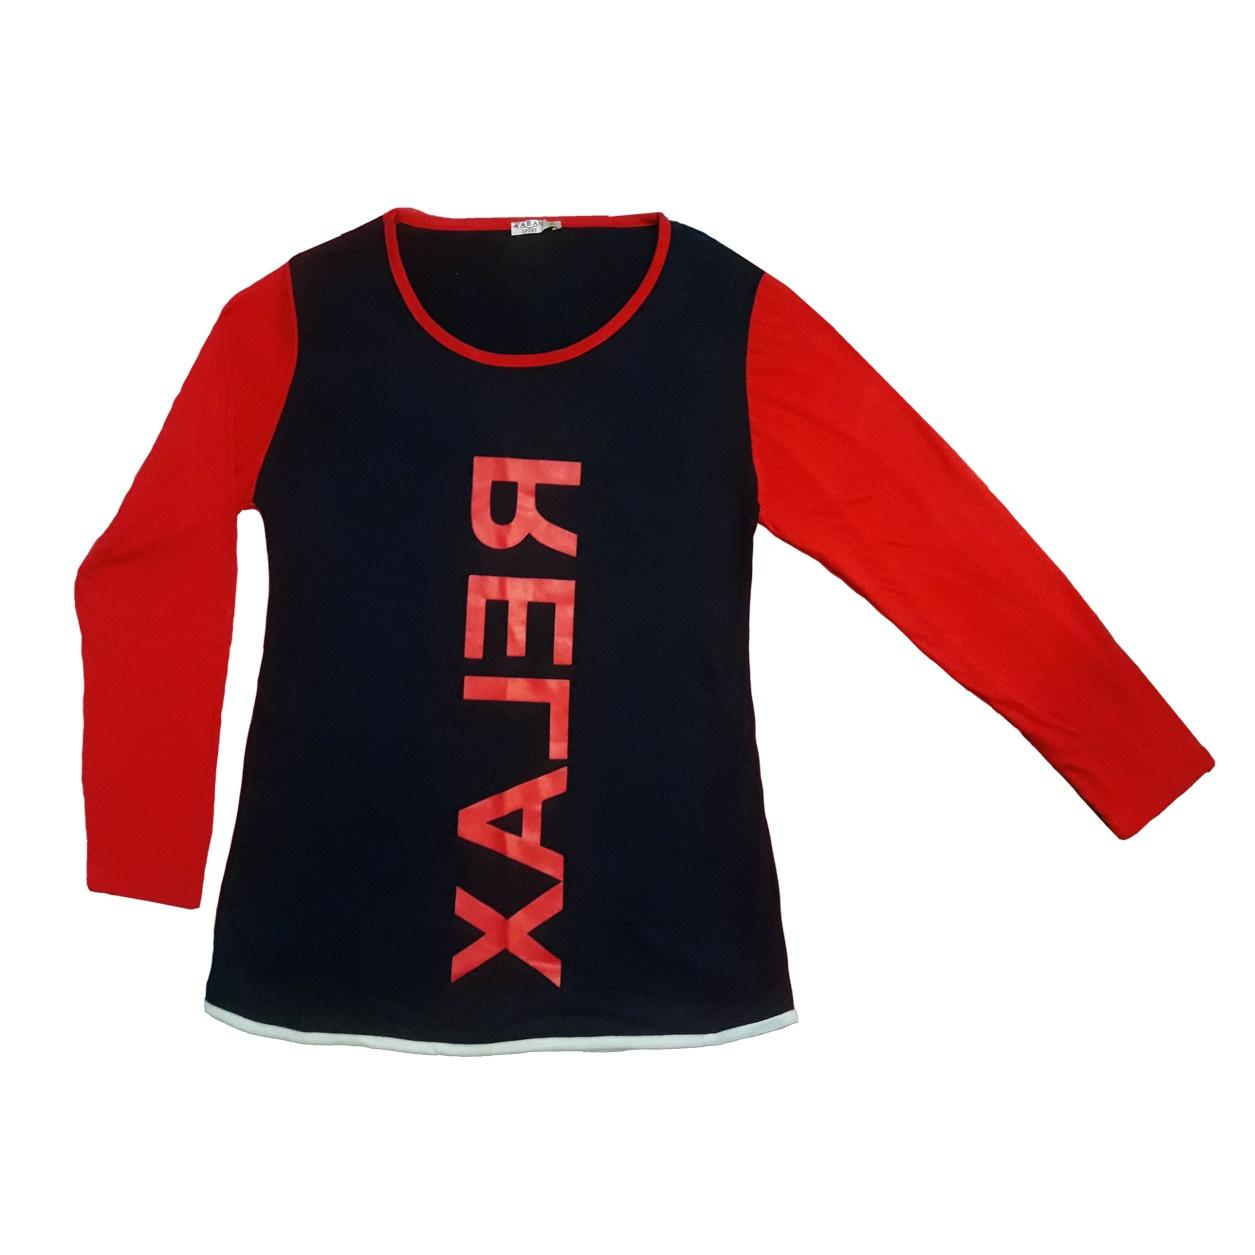 Photo of تی شرت آستین بلند زنانه طرح RELAX رنگ سرمه ای